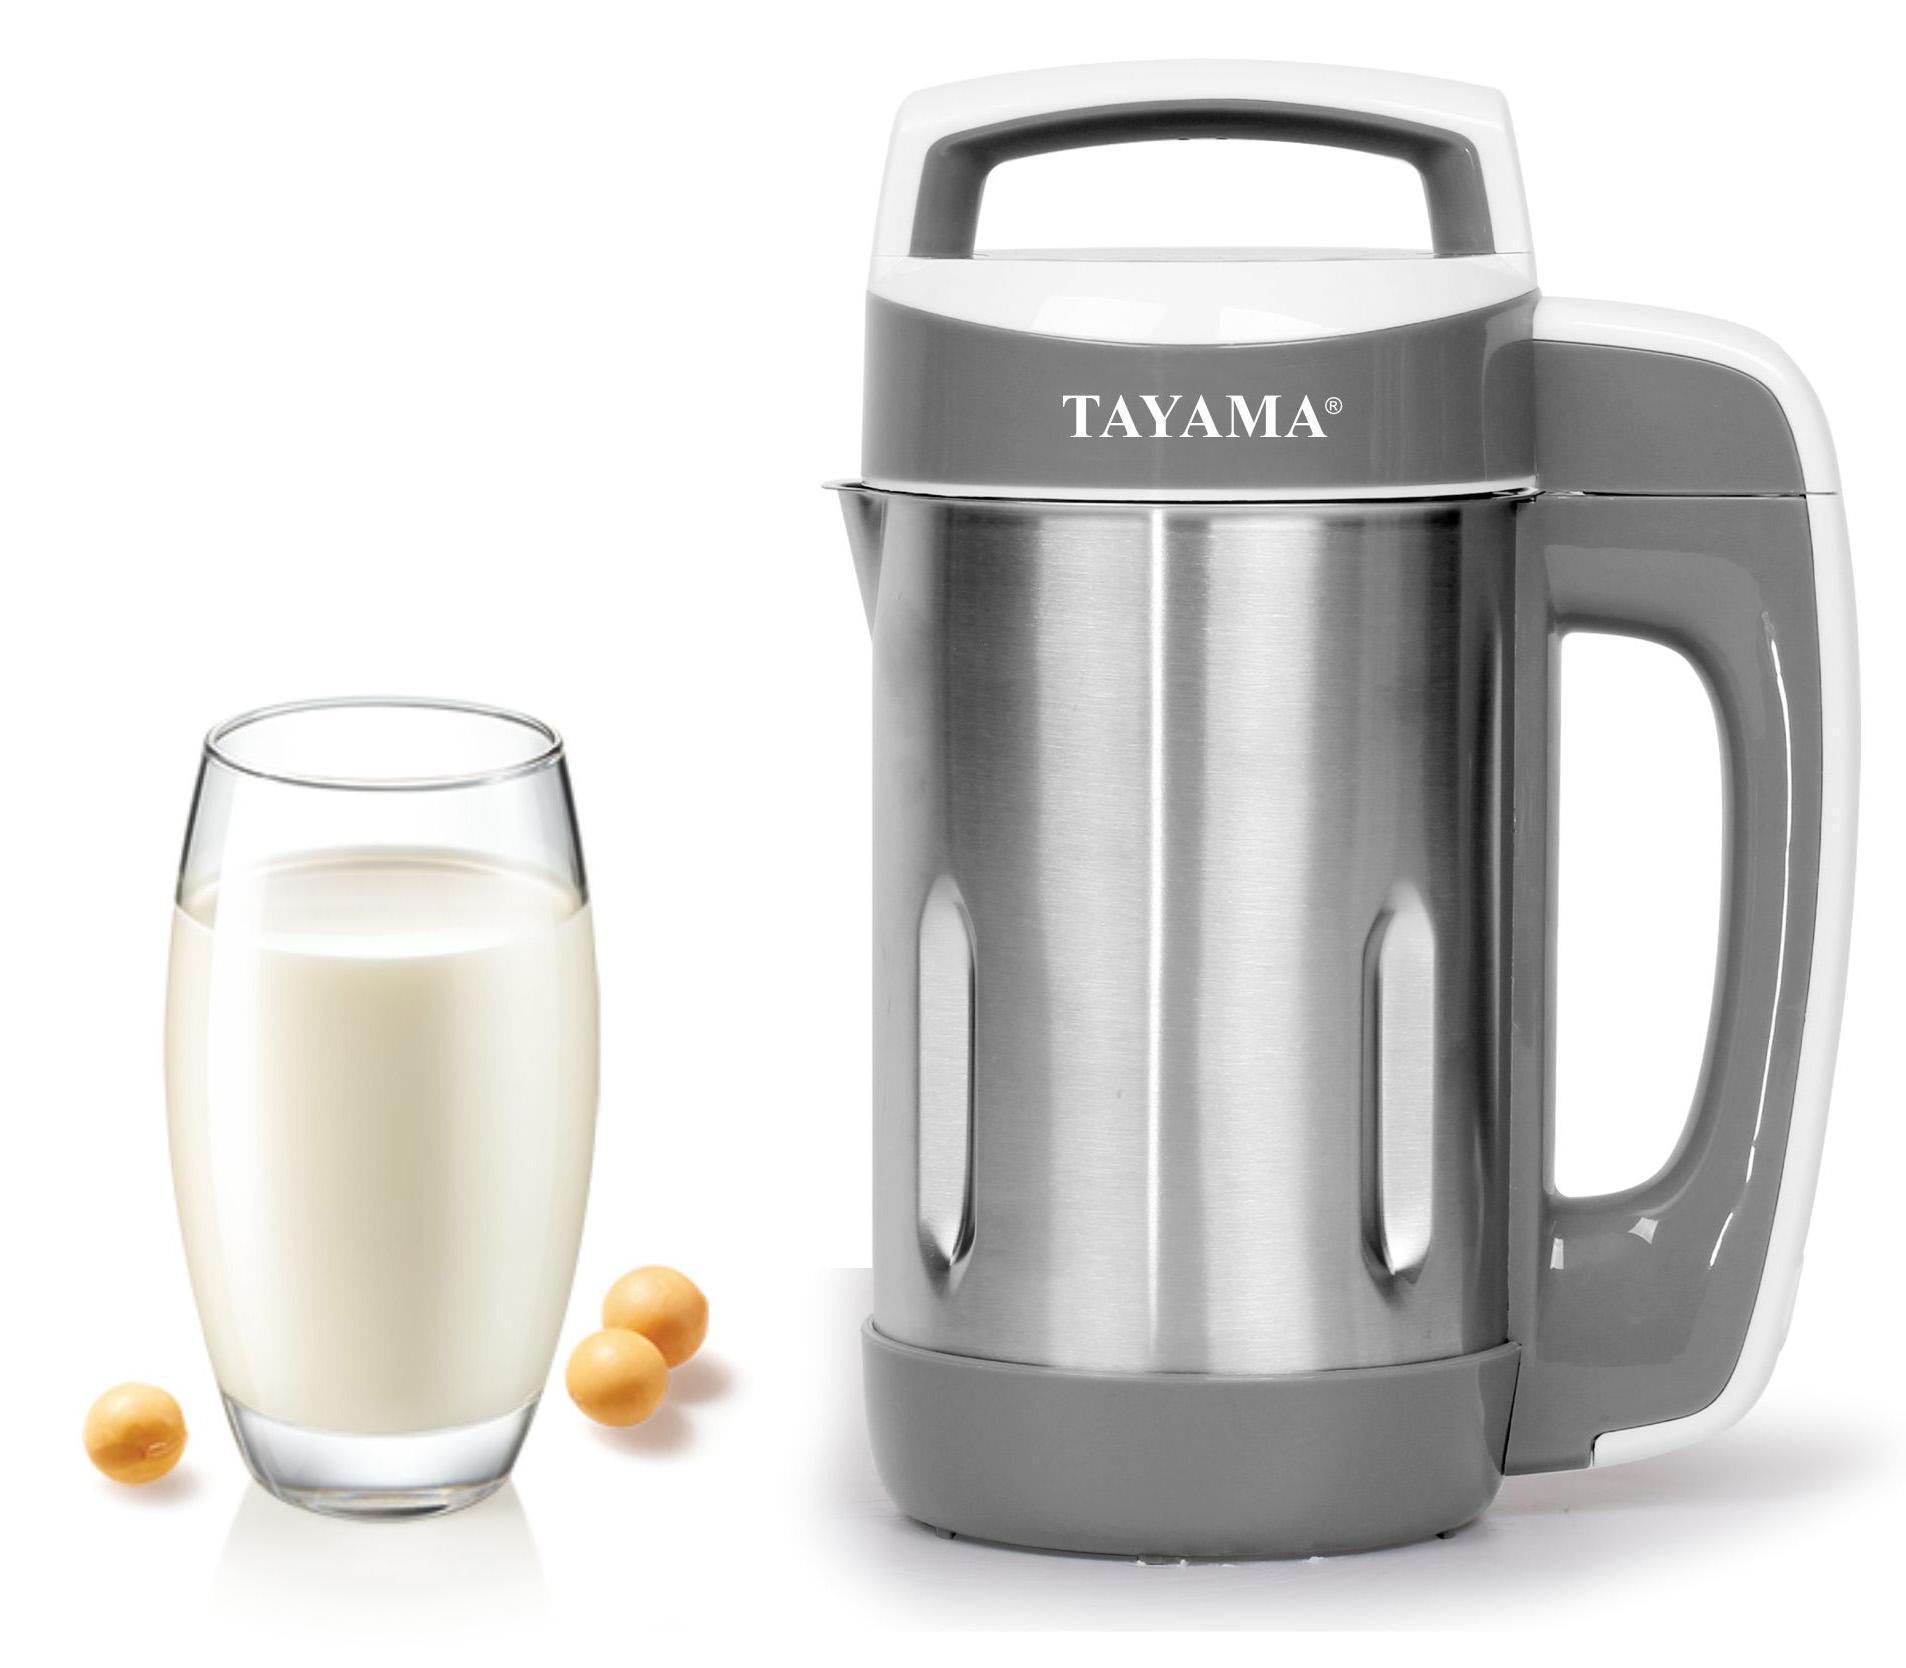 Amazon Tayama Stainless Steel Soymilk Maker 1 1L Kitchen